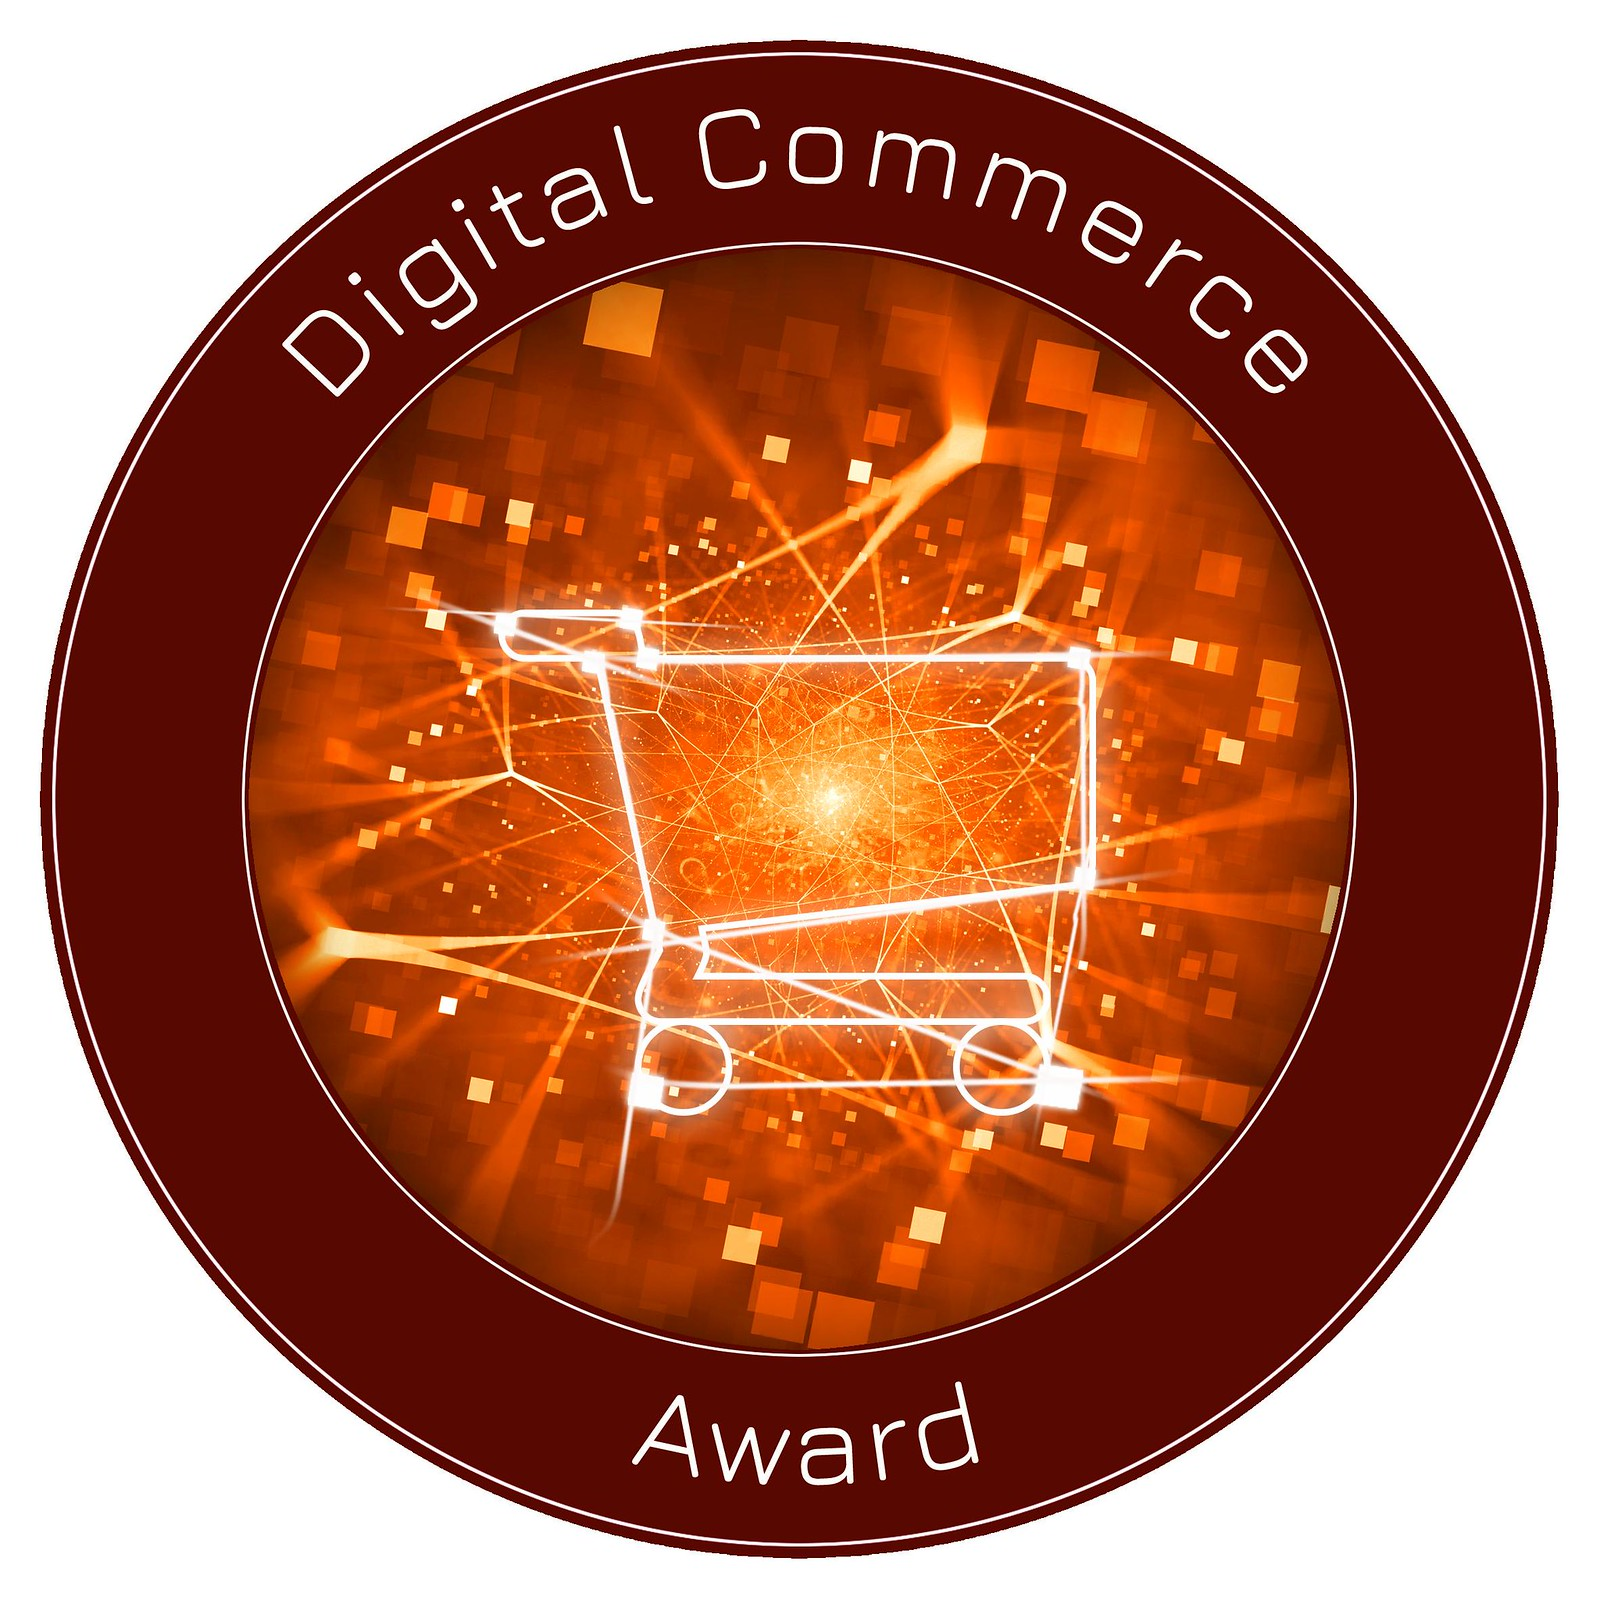 Digital Commerce Award 2021